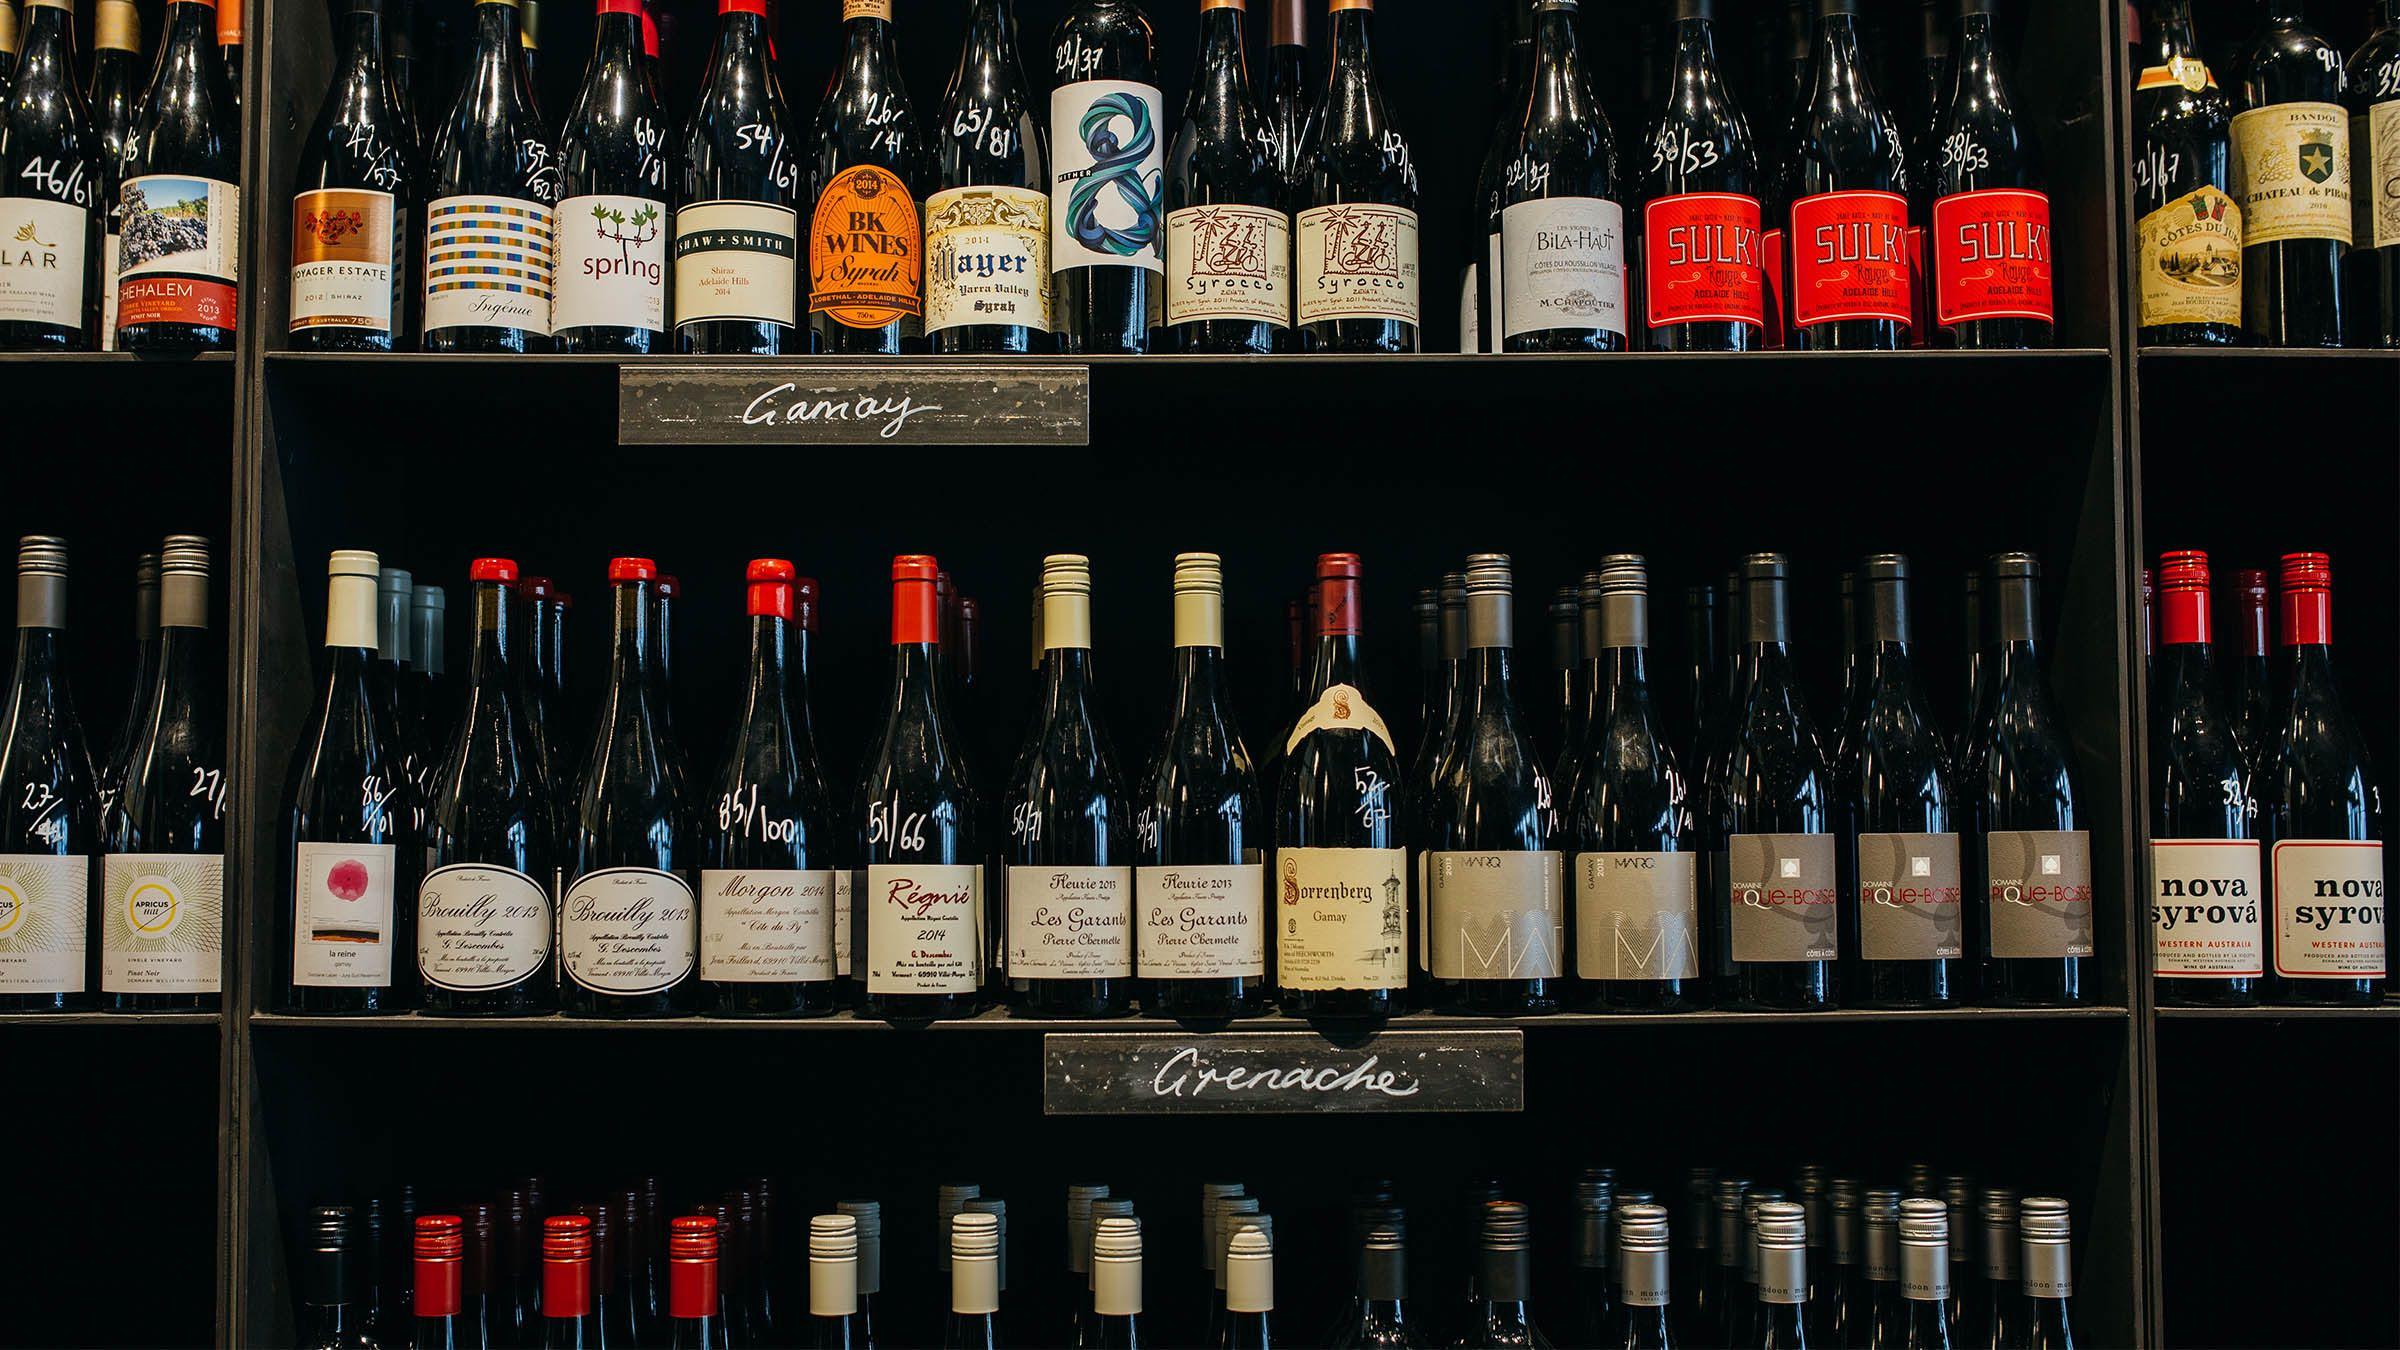 Petition Wine Bar & Merchant